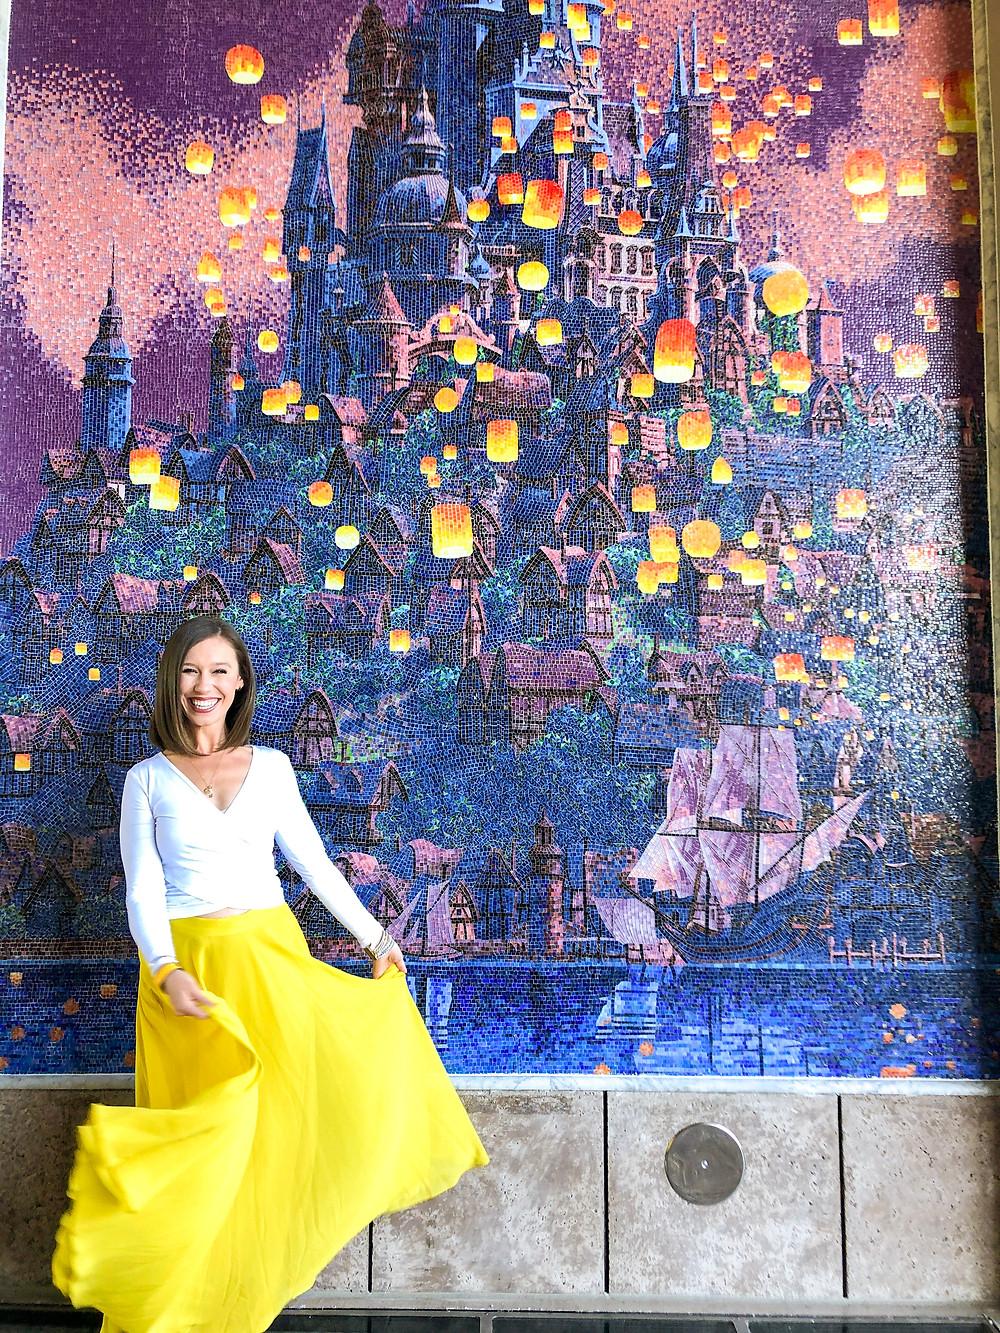 Tangled mosaic at Disney's Riviera Resort